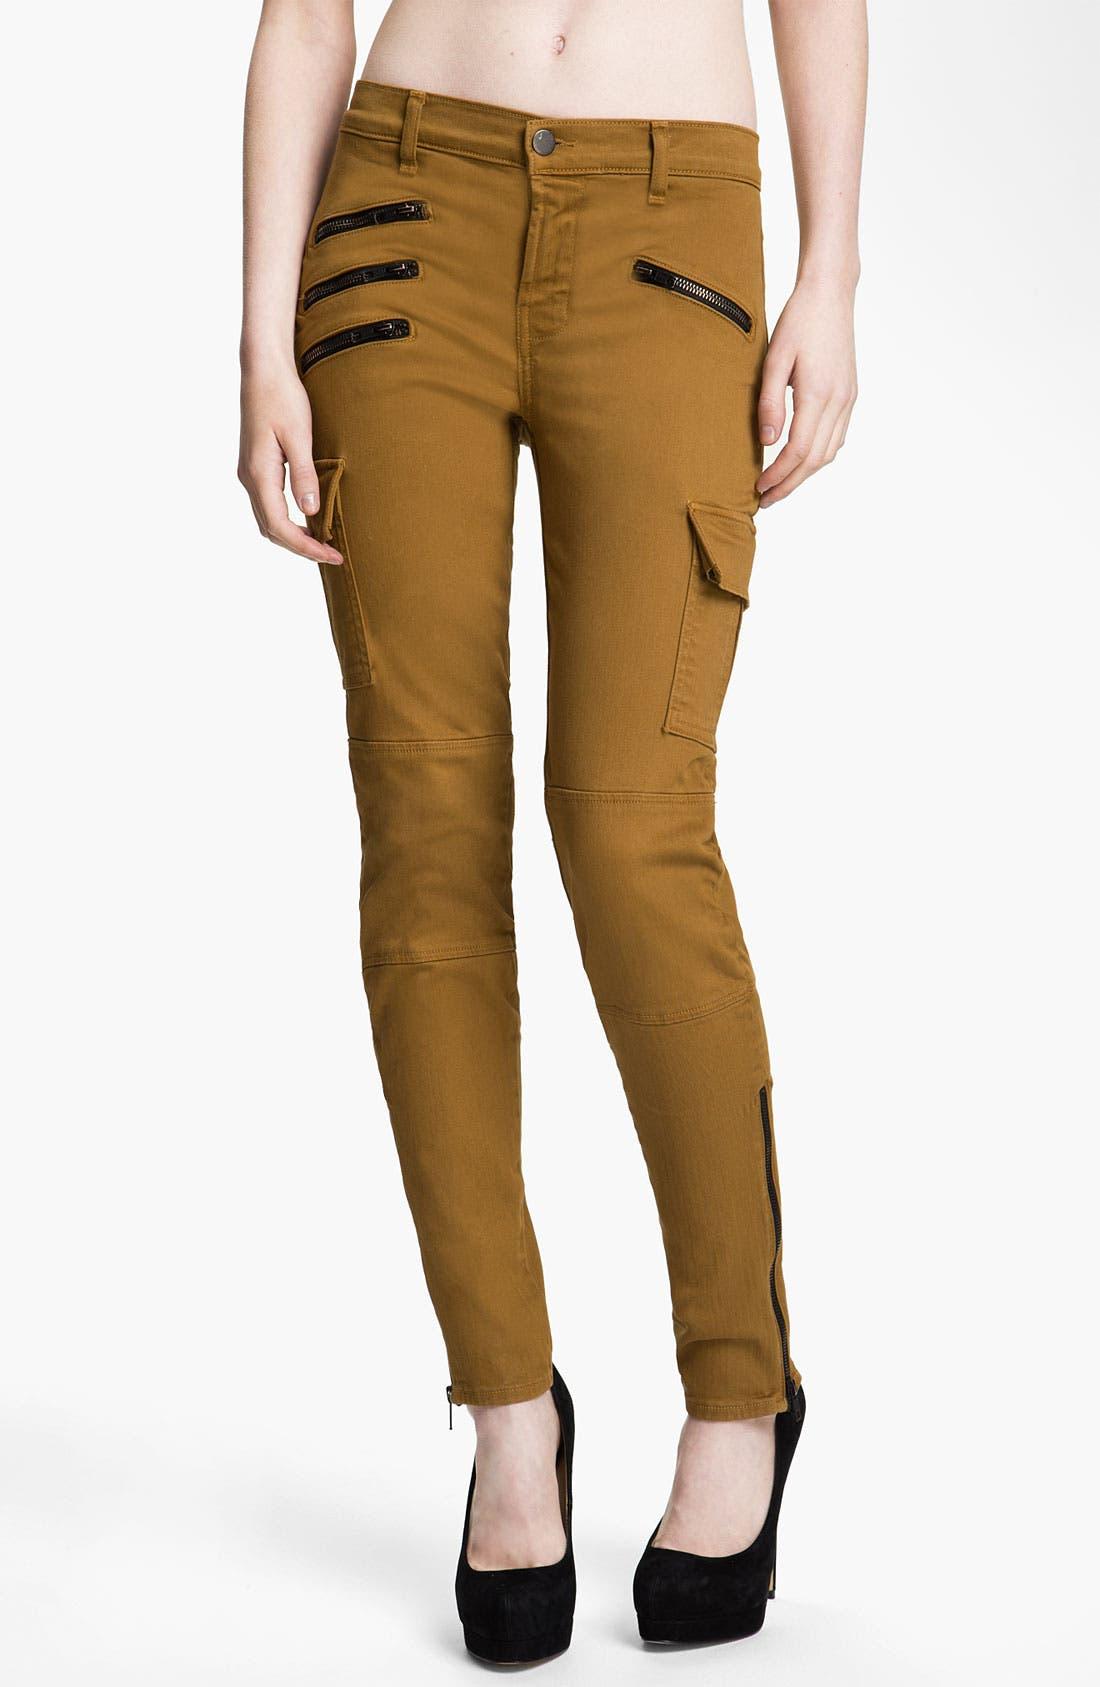 Alternate Image 1 Selected - J Brand 'The Brix' Slim Leg Pants